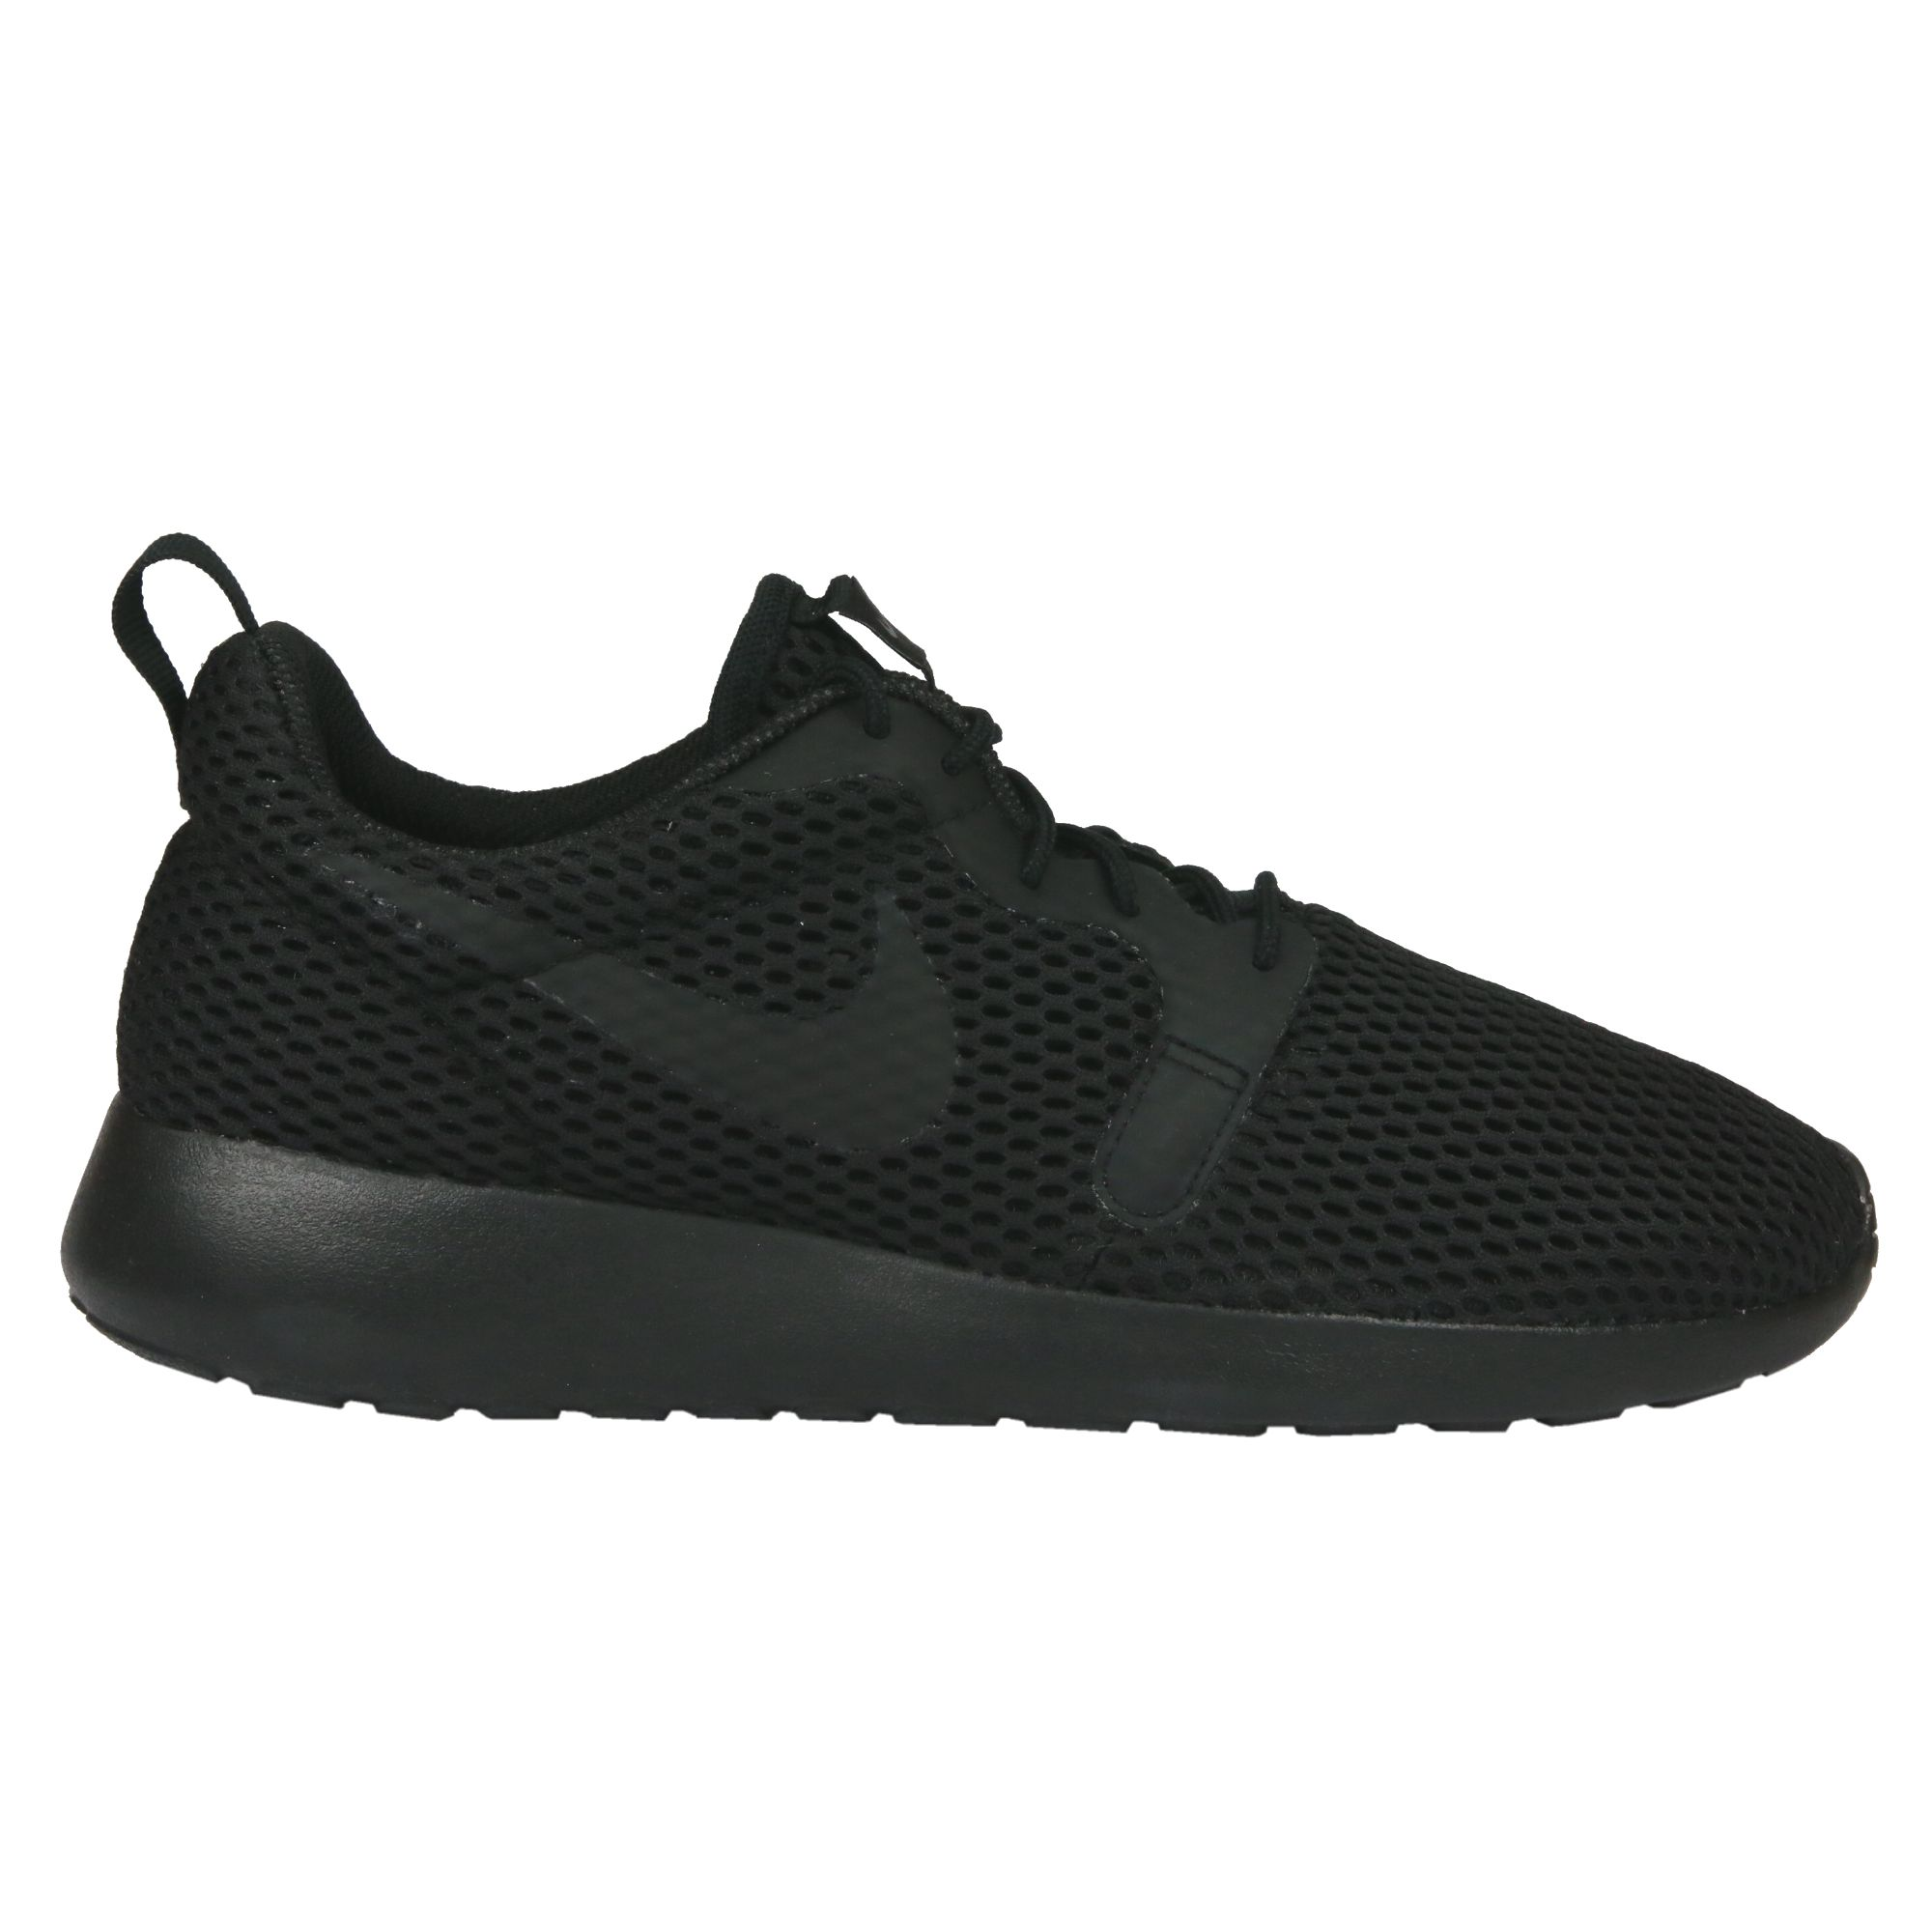 newest c0881 81557 ... Nike roshe one zapatos zapatillas zapatillas Rosherun run señora ...